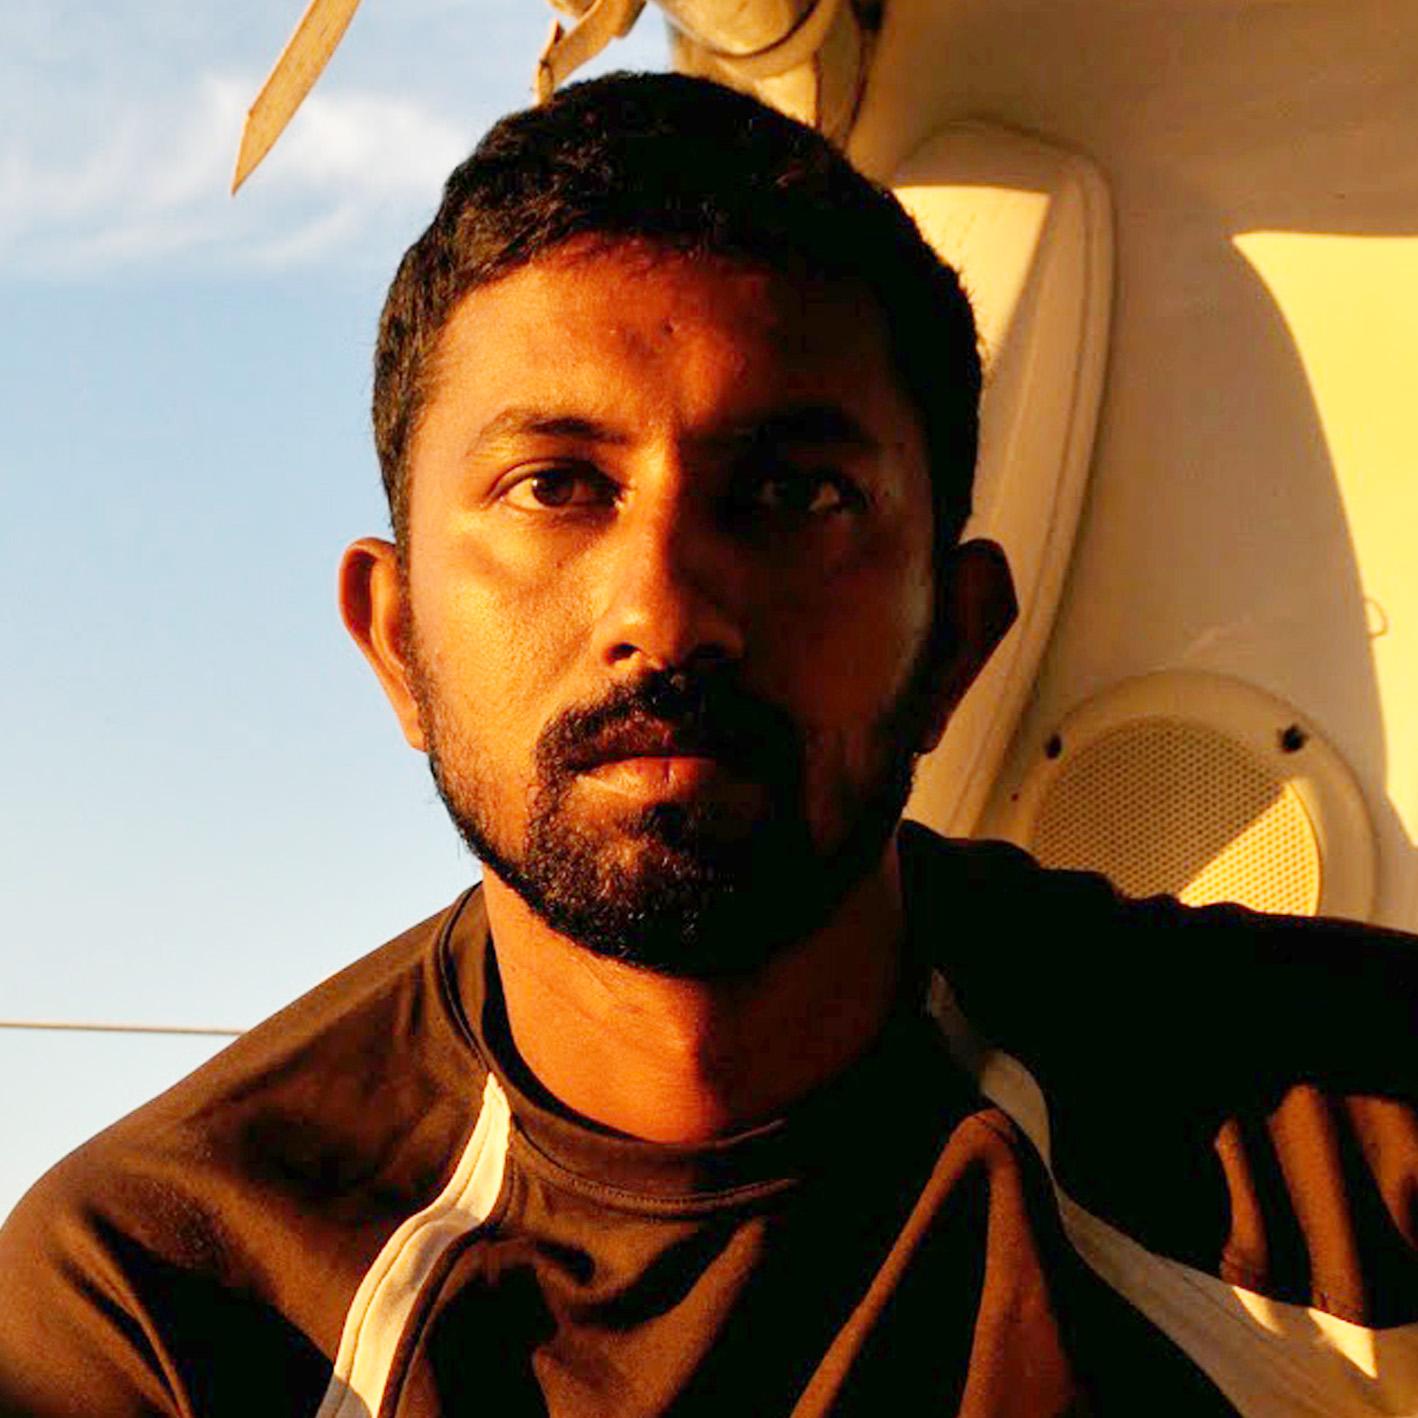 Cdr Abhilash Tomy of Indian Navy